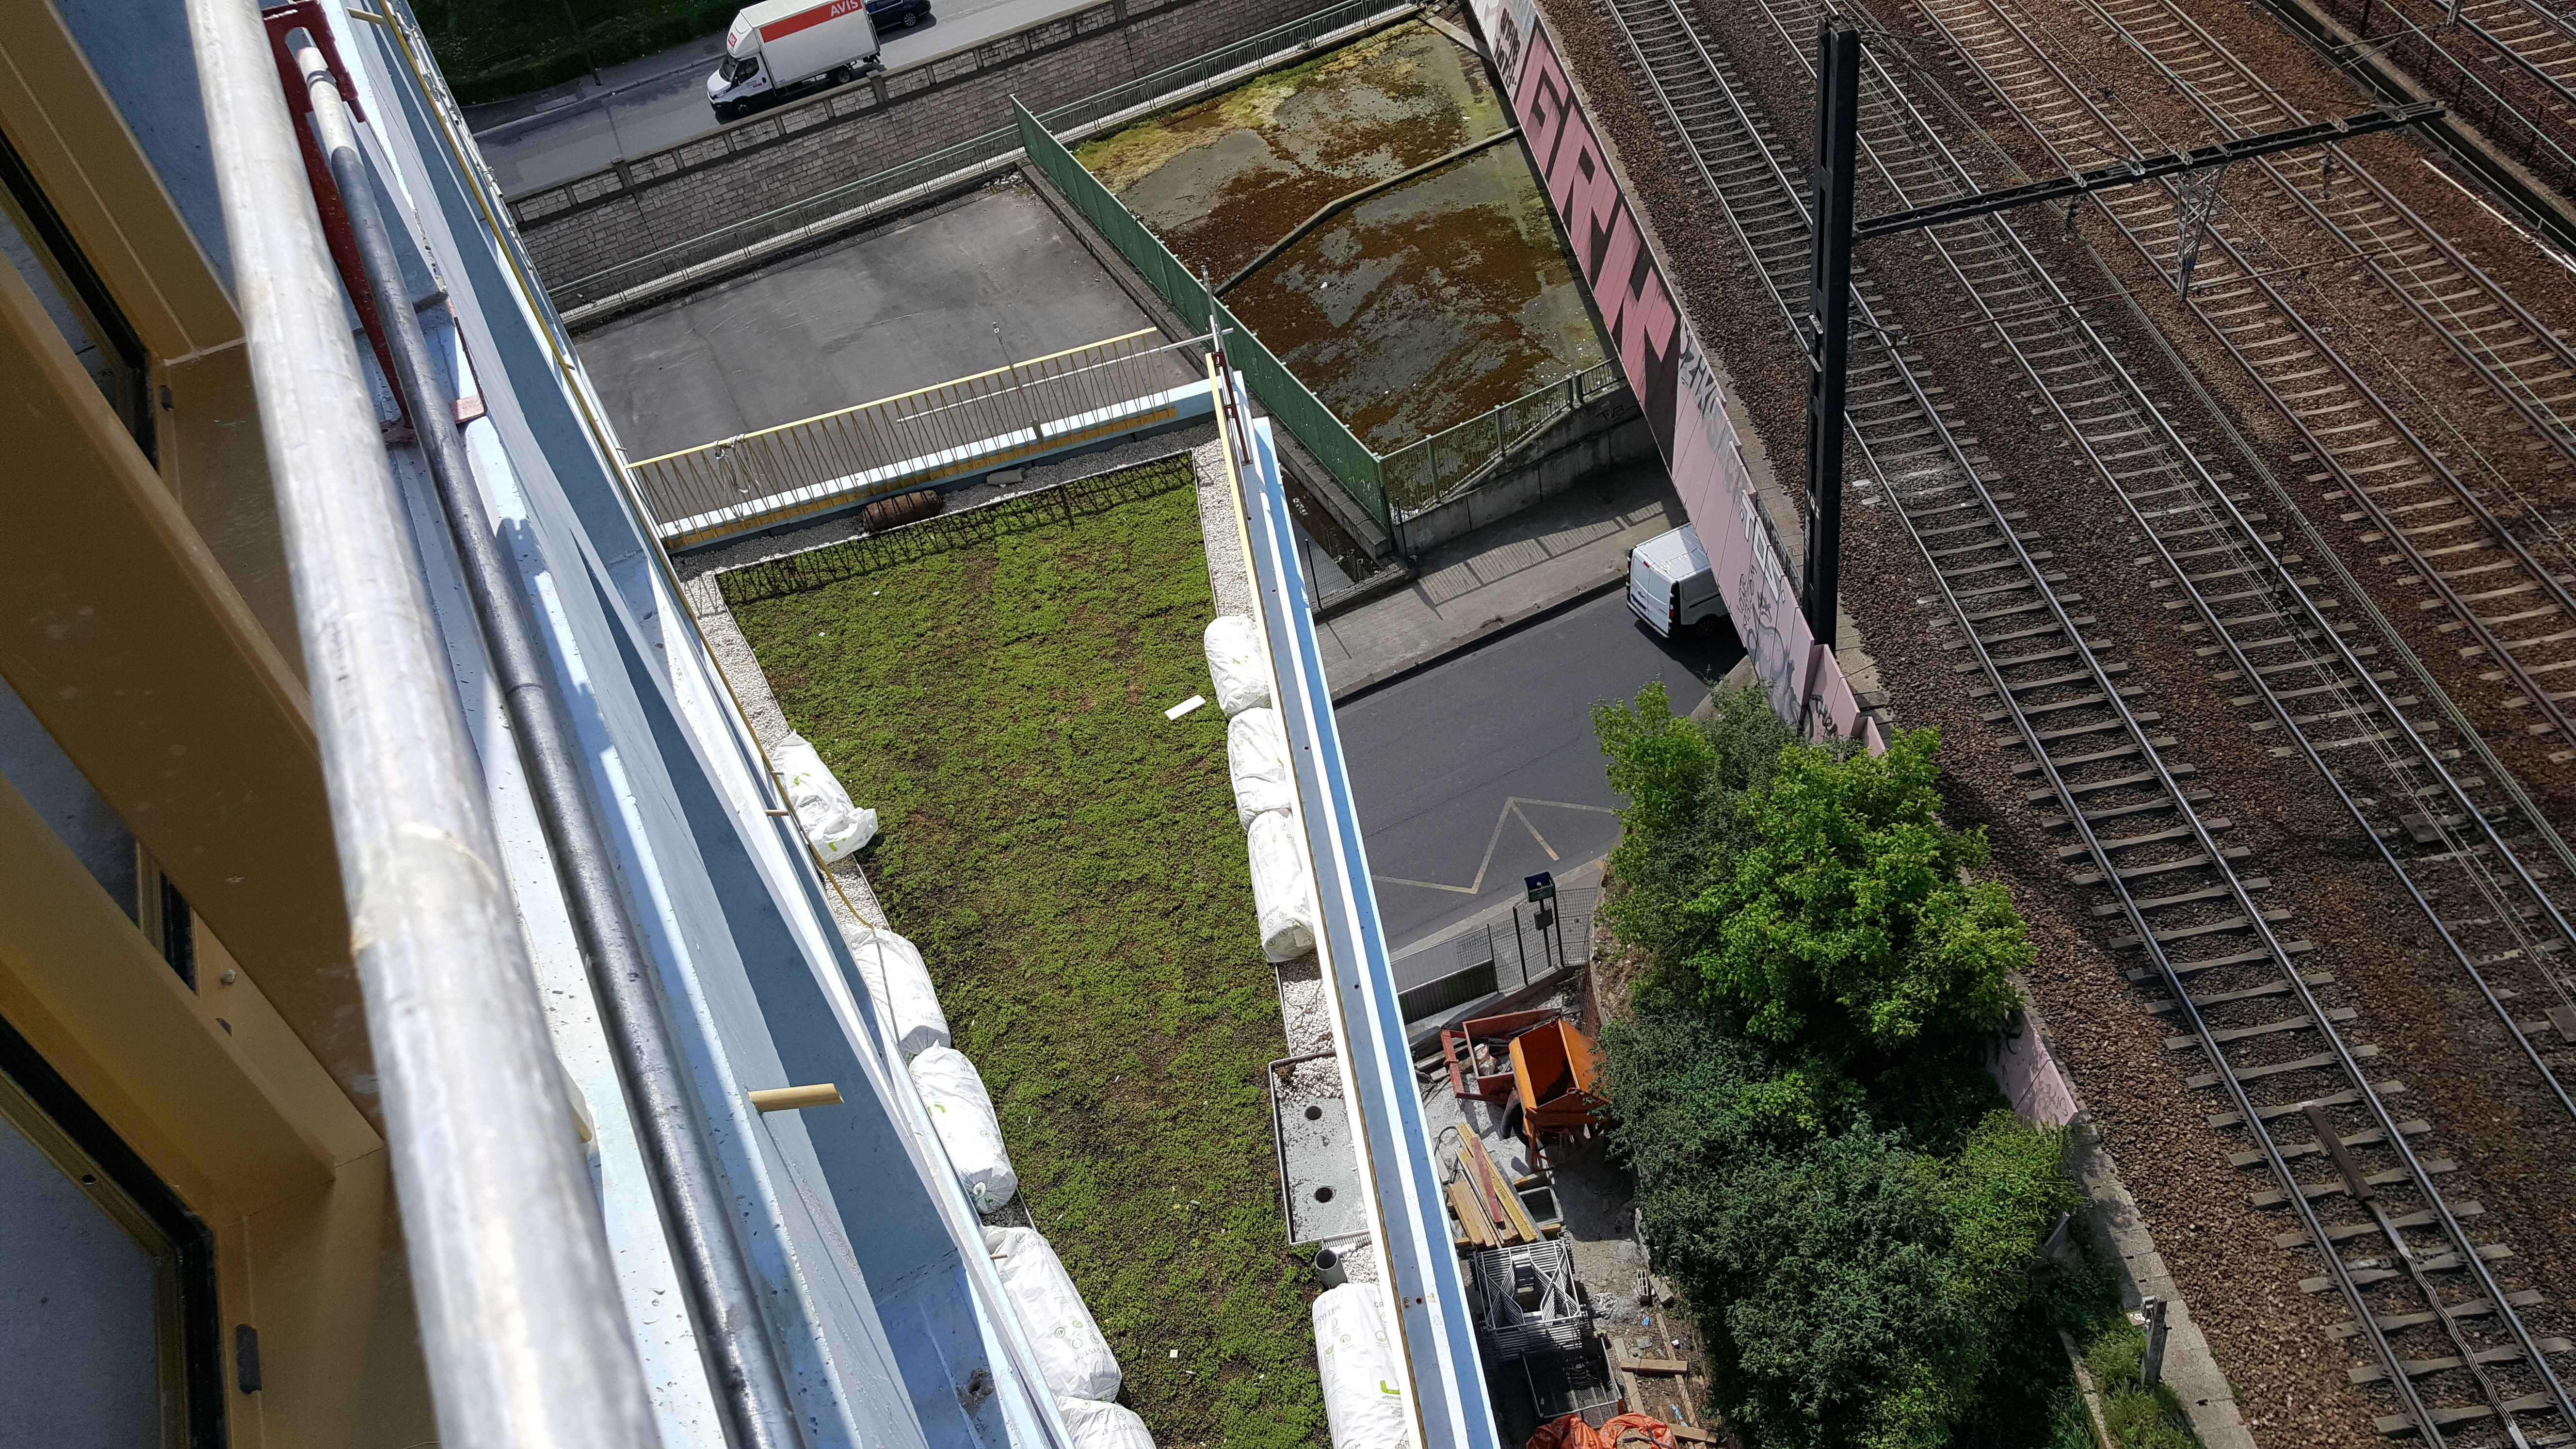 Green Roof Cetradiv Location Rue Julia Bartet Paris 220m Concrete Building Roof Is Built For Building Owner Rivp Green Roof Architecture